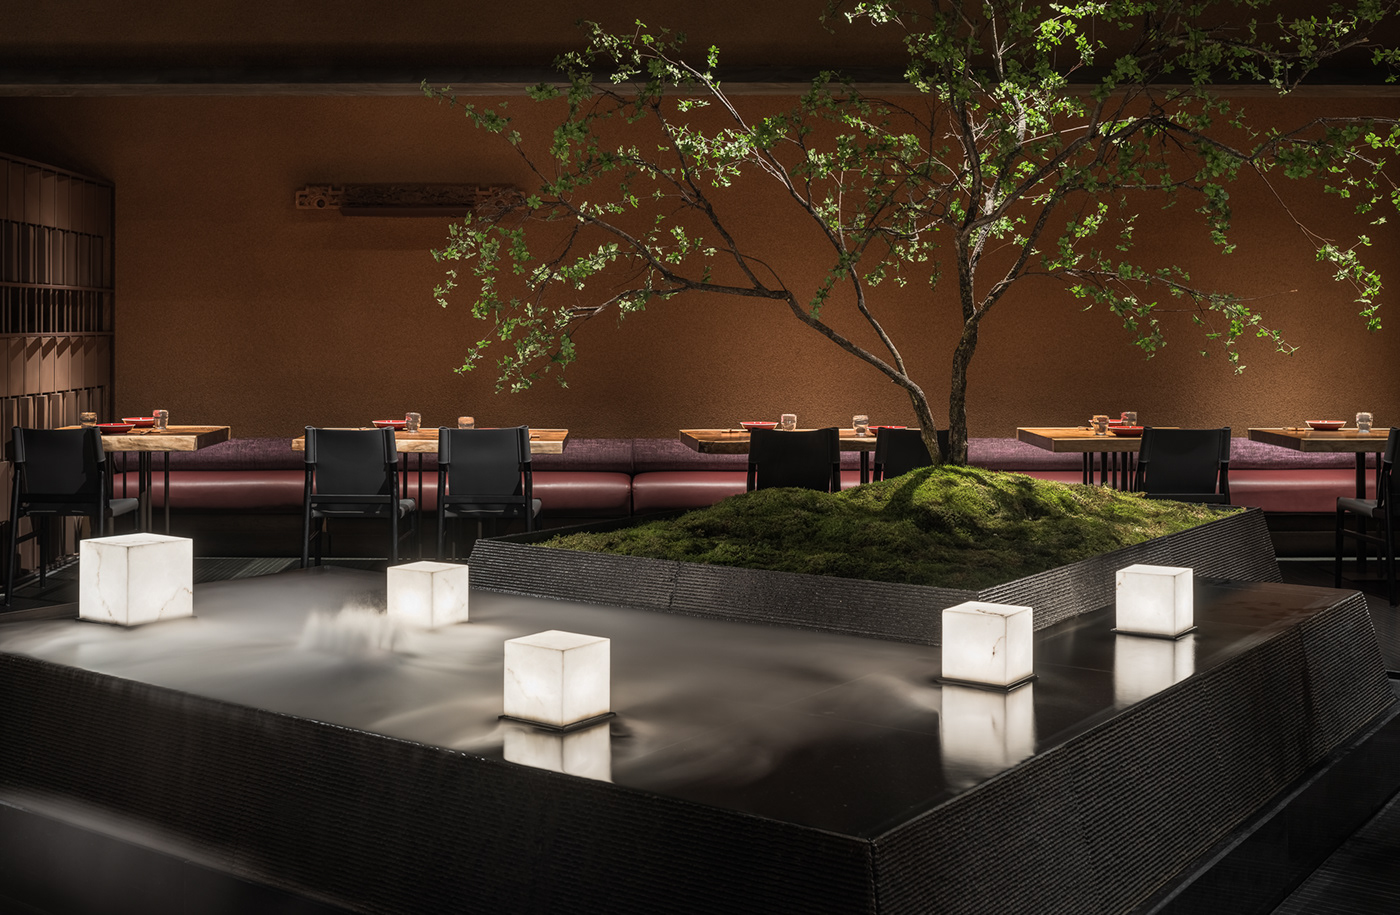 interior design  Photography  restaurant JINGLE Design Shenyang studio TEN Tan xiao